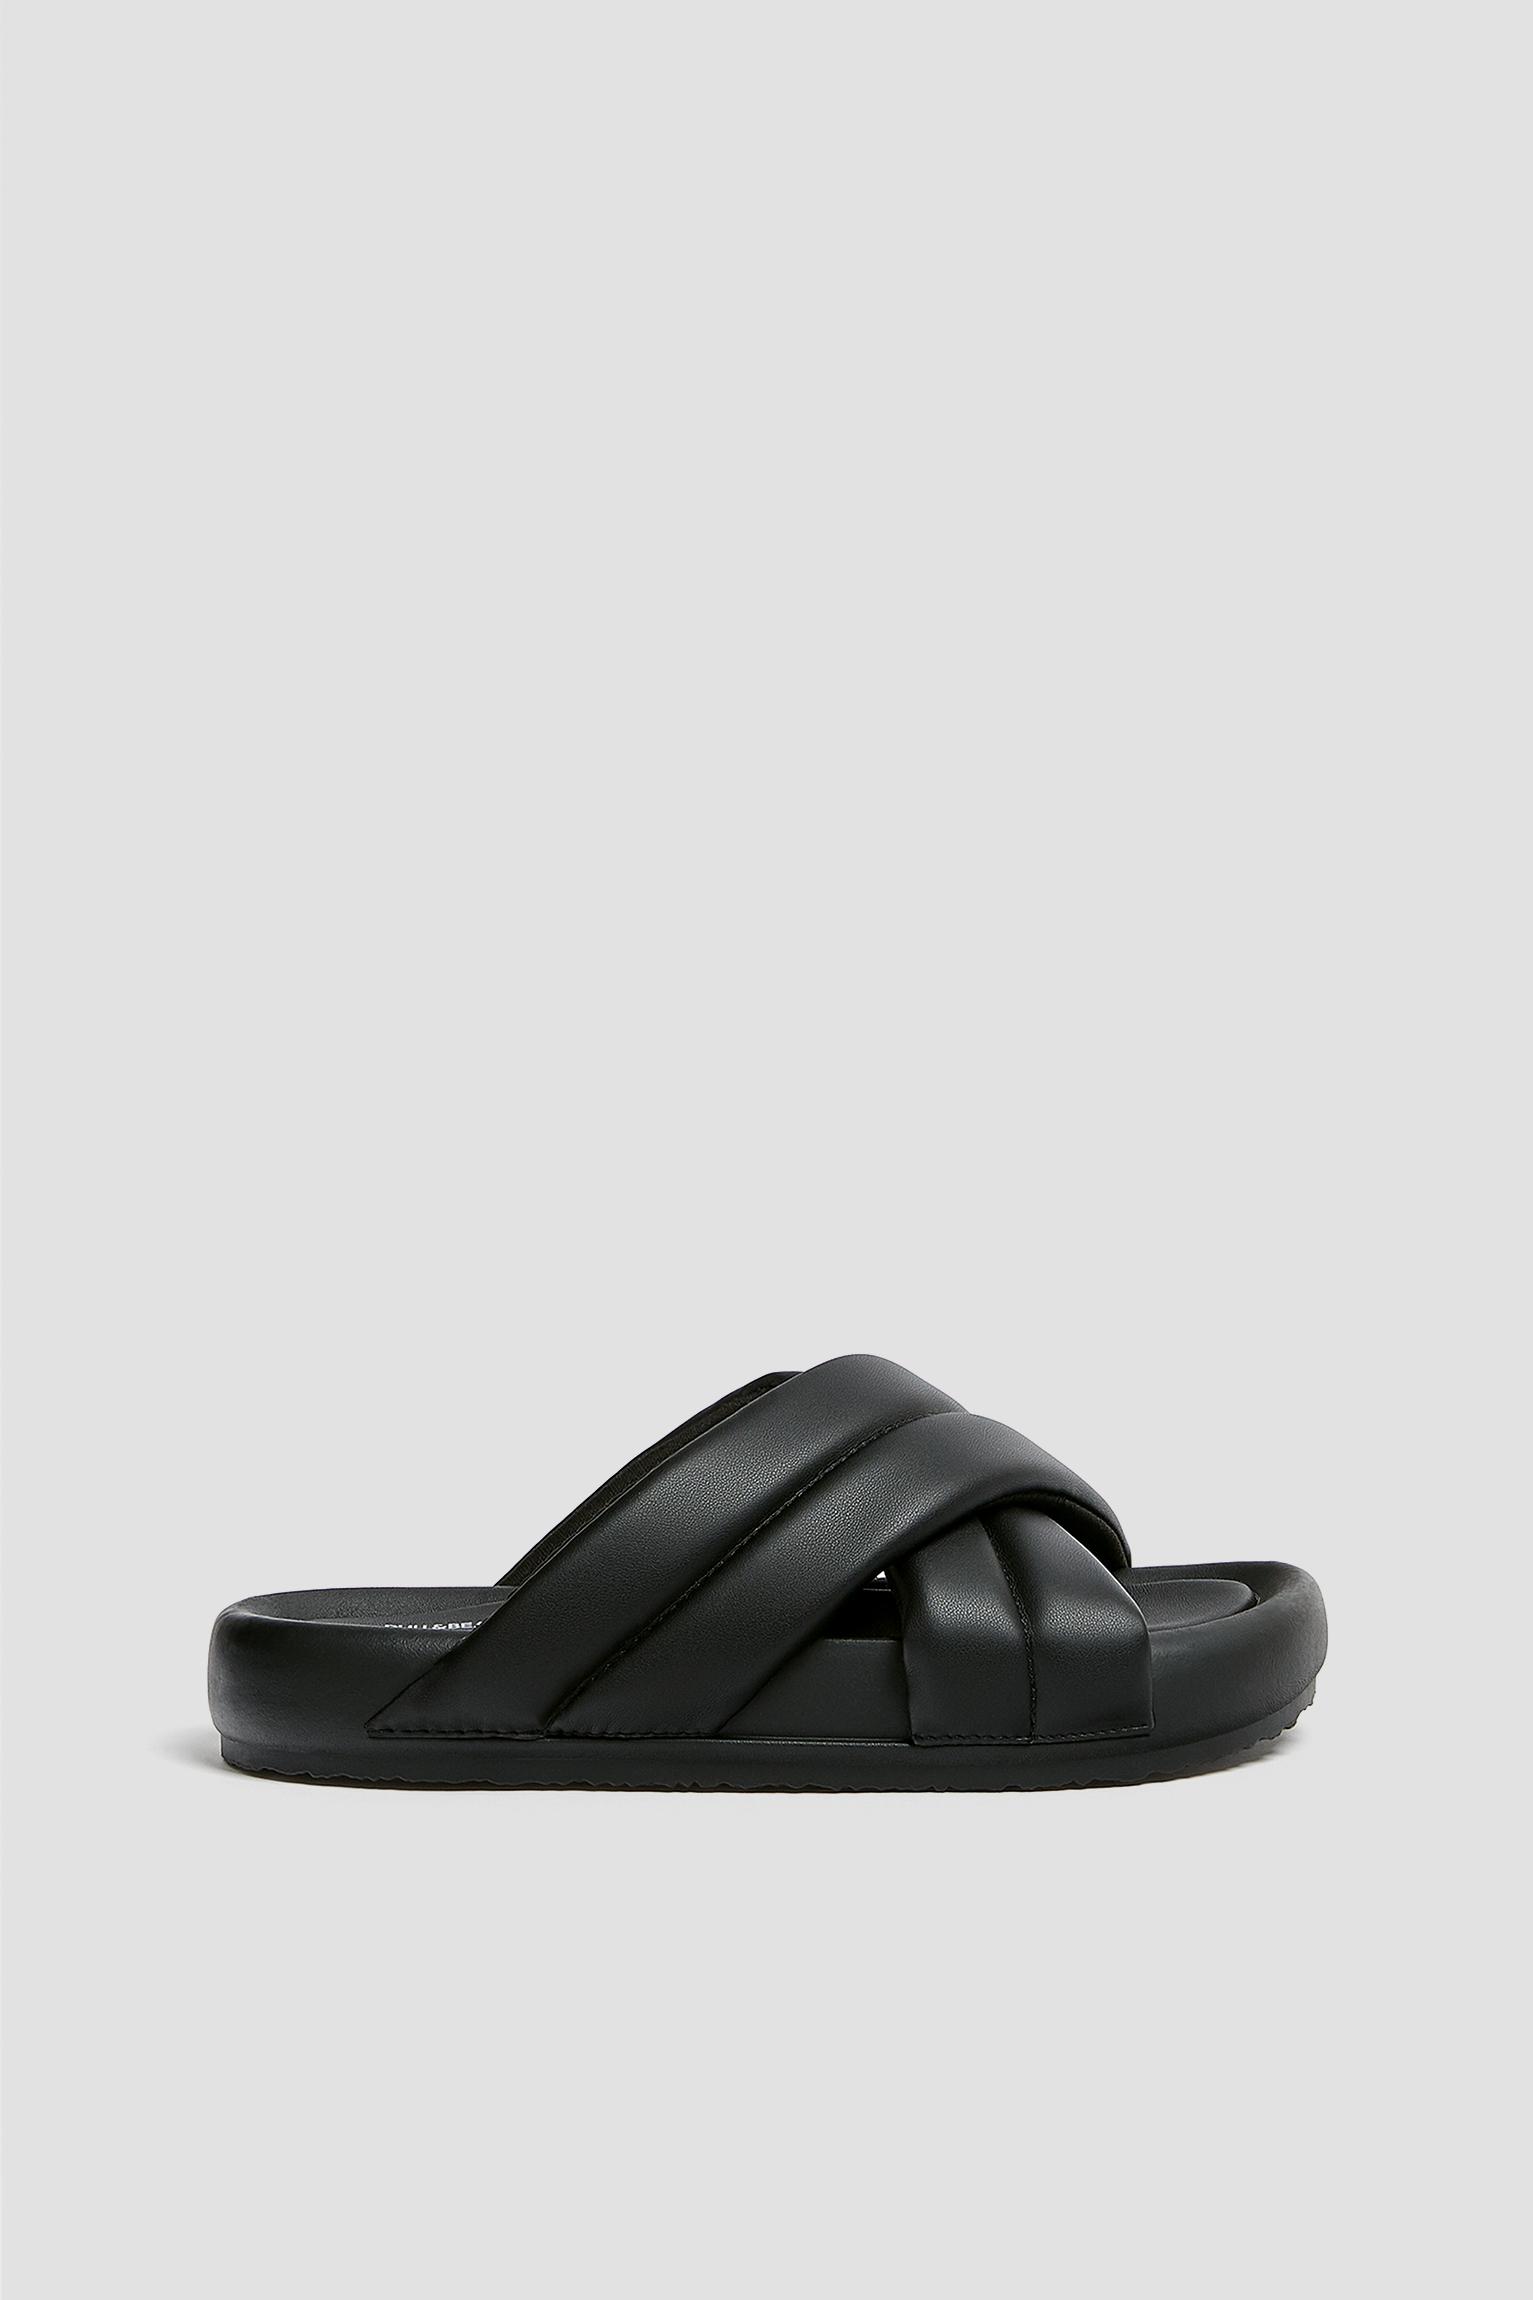 Padded flat crossover sandals - PULL\u0026BEAR